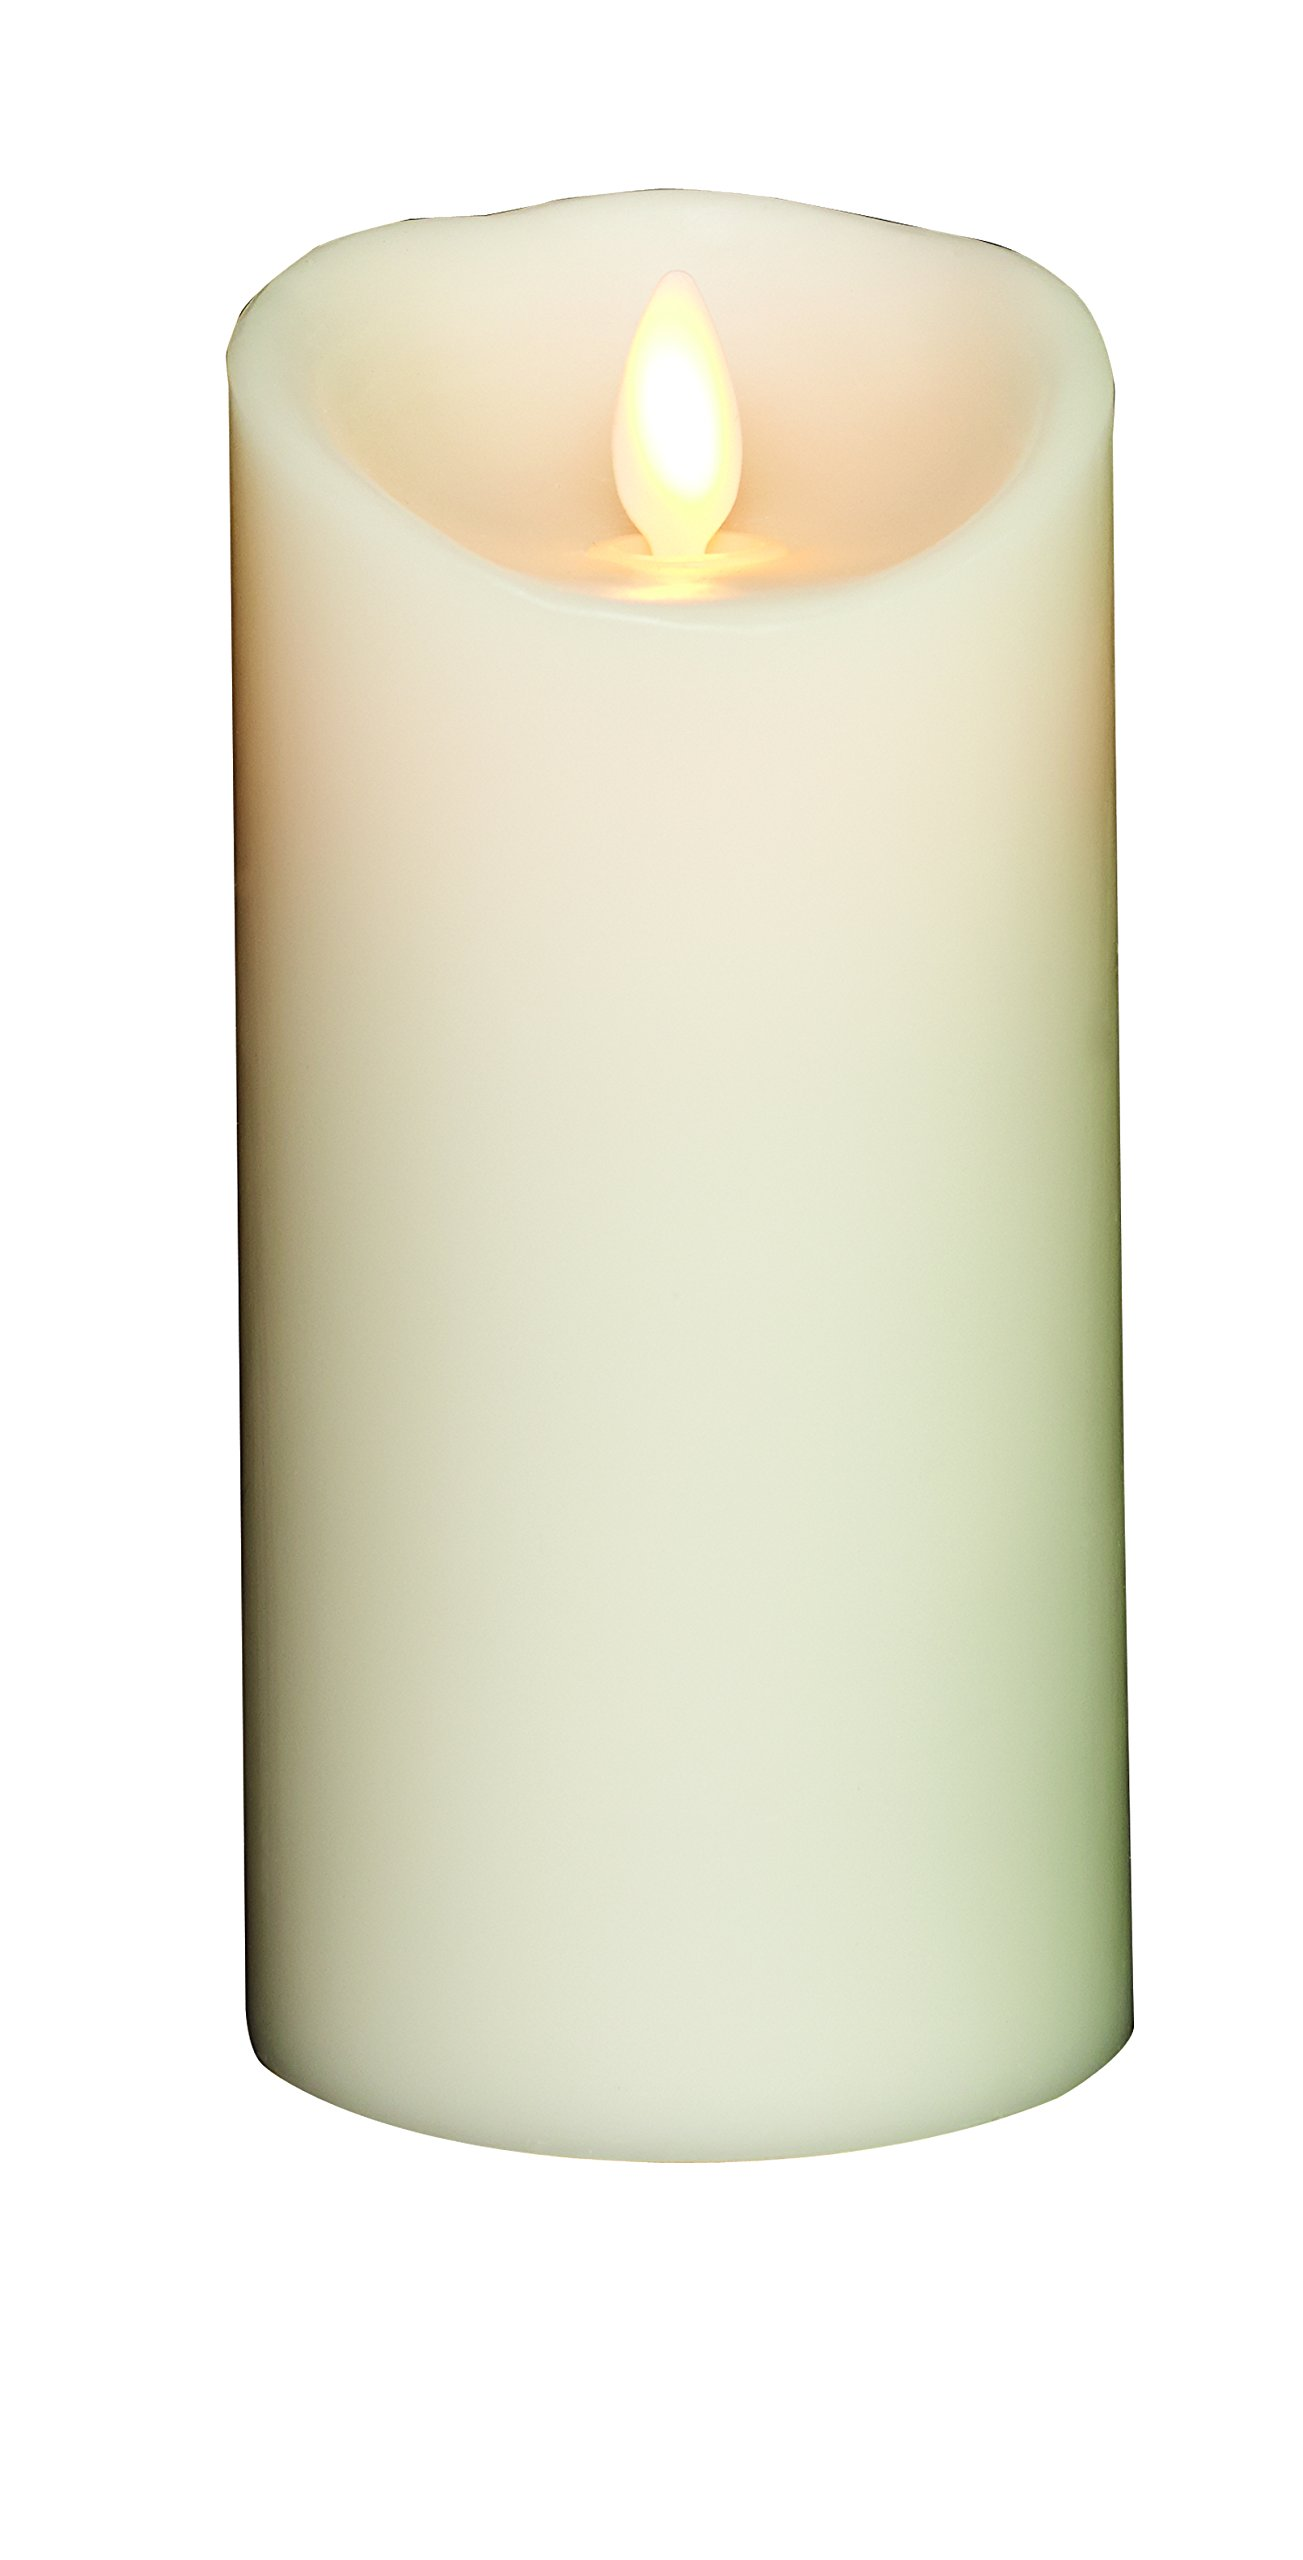 Bethlehem Lighting Torchier Wax Flameless Candle 3.5x7 Ivory